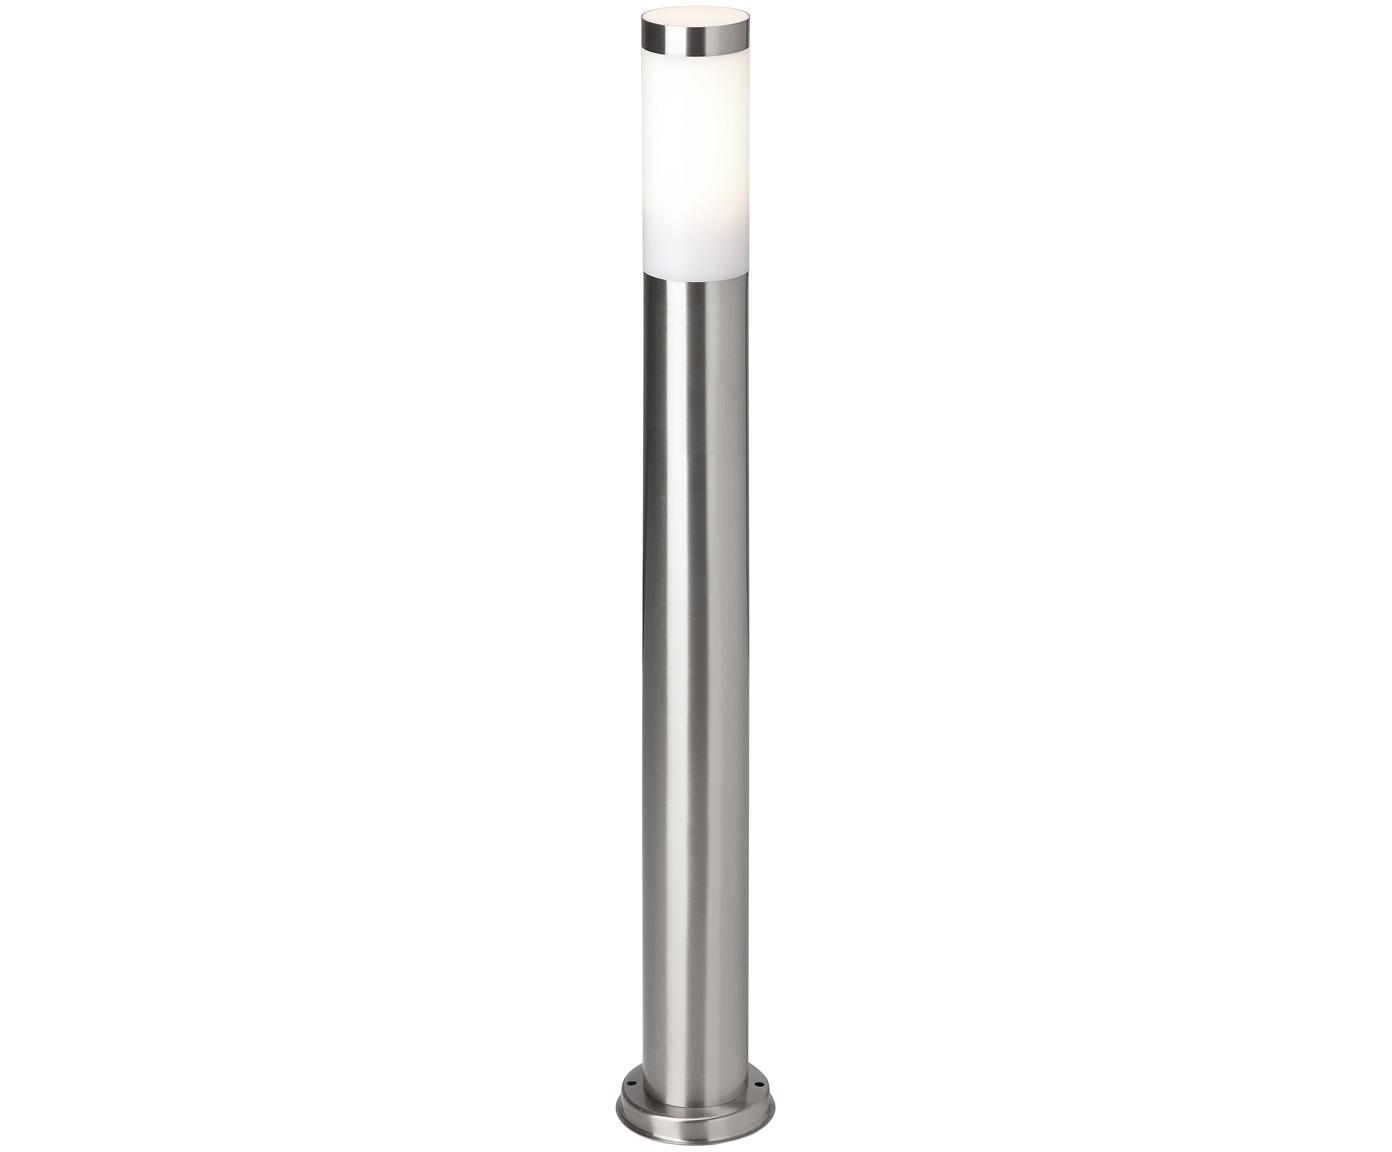 Lámpara de pie para exterior Chorus, Acero inoxidable, blanco, Ø 8 x Al 80 cm